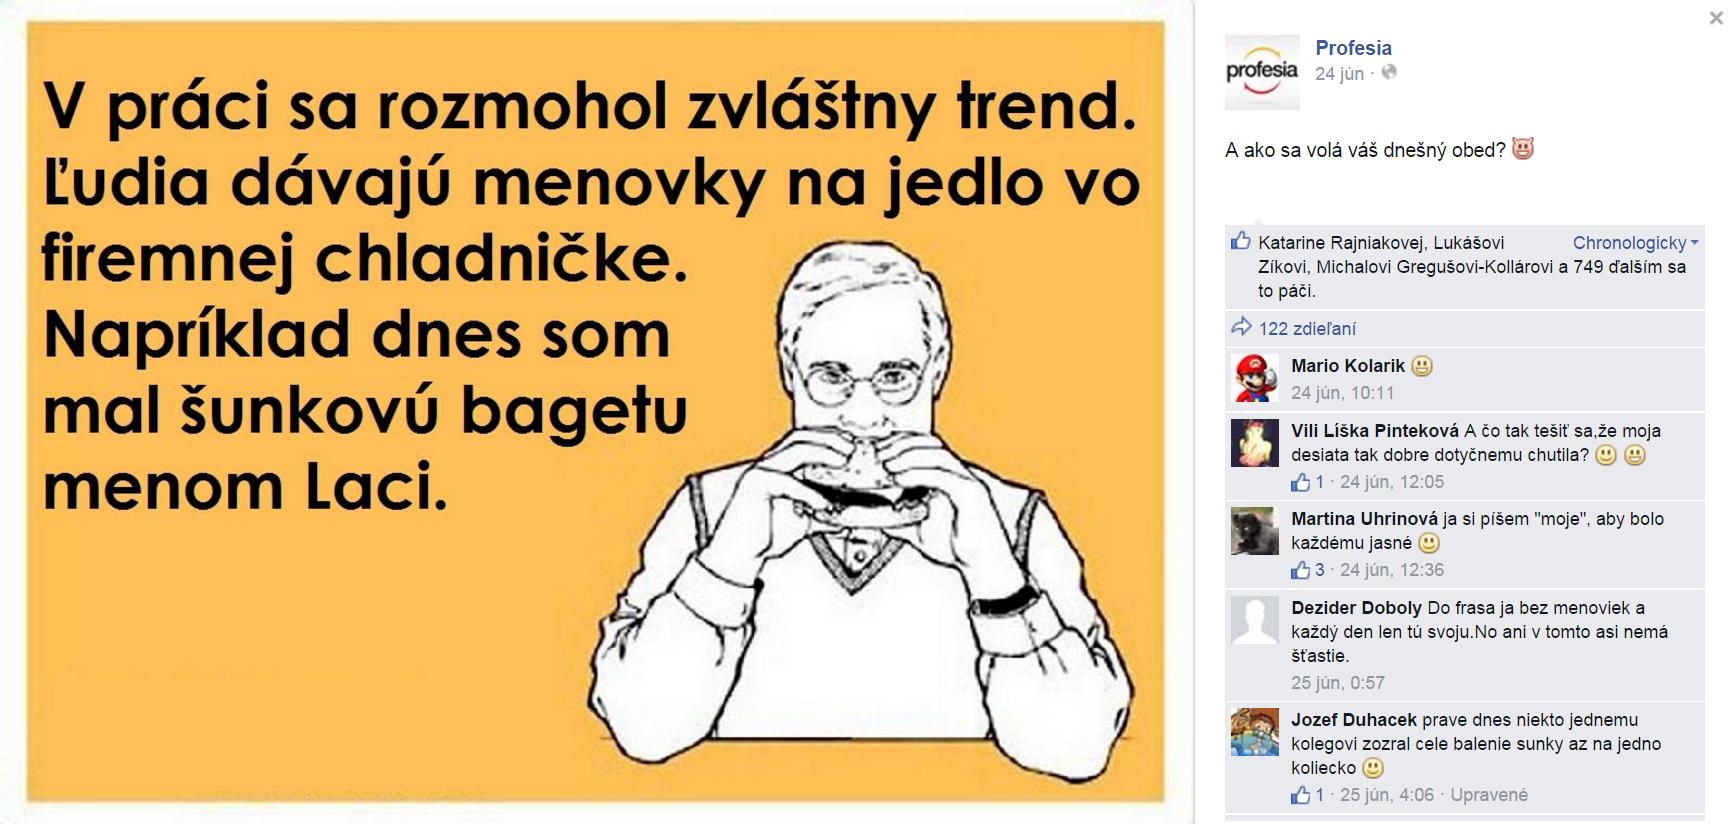 Profesia_Facebook_2015_01